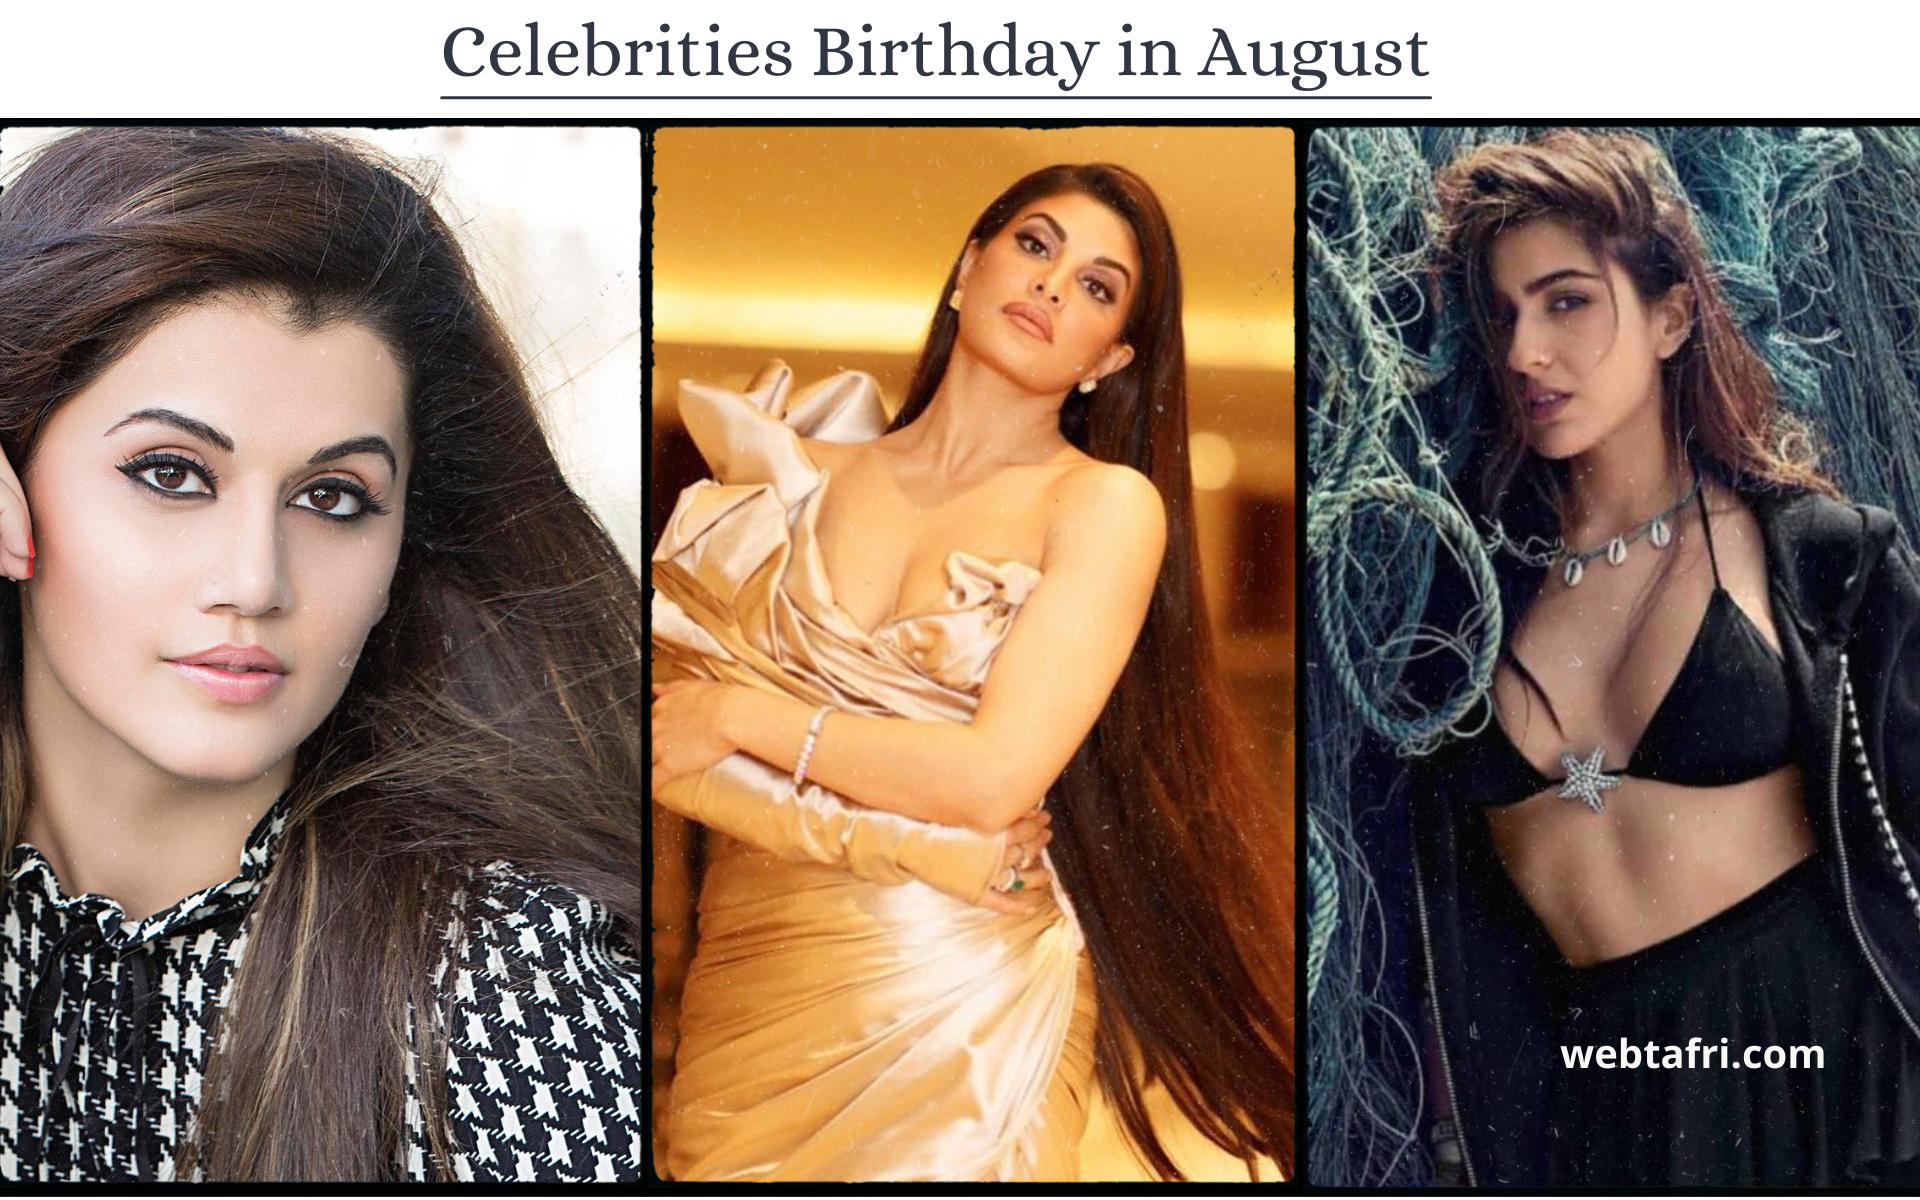 Celebrities Birthday in August